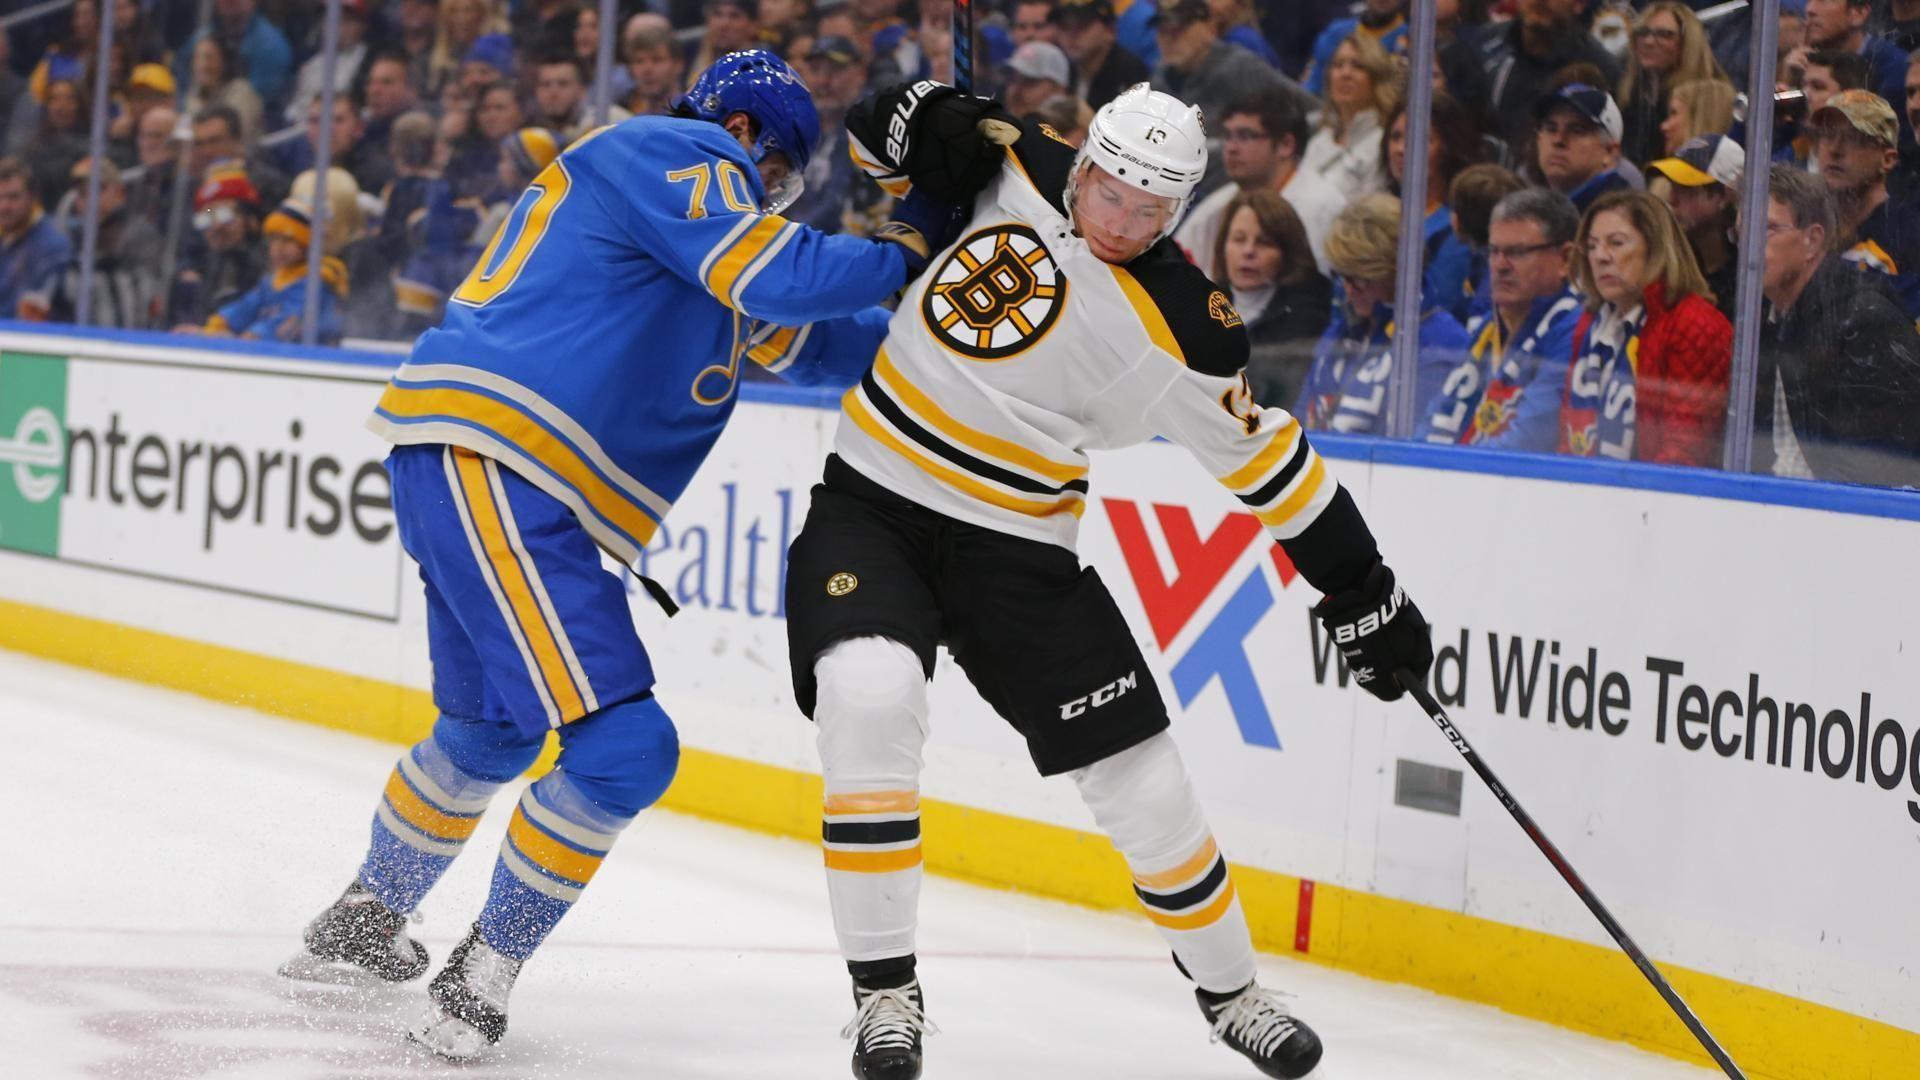 Blues end Bruins' sevengame winning streak in shootout